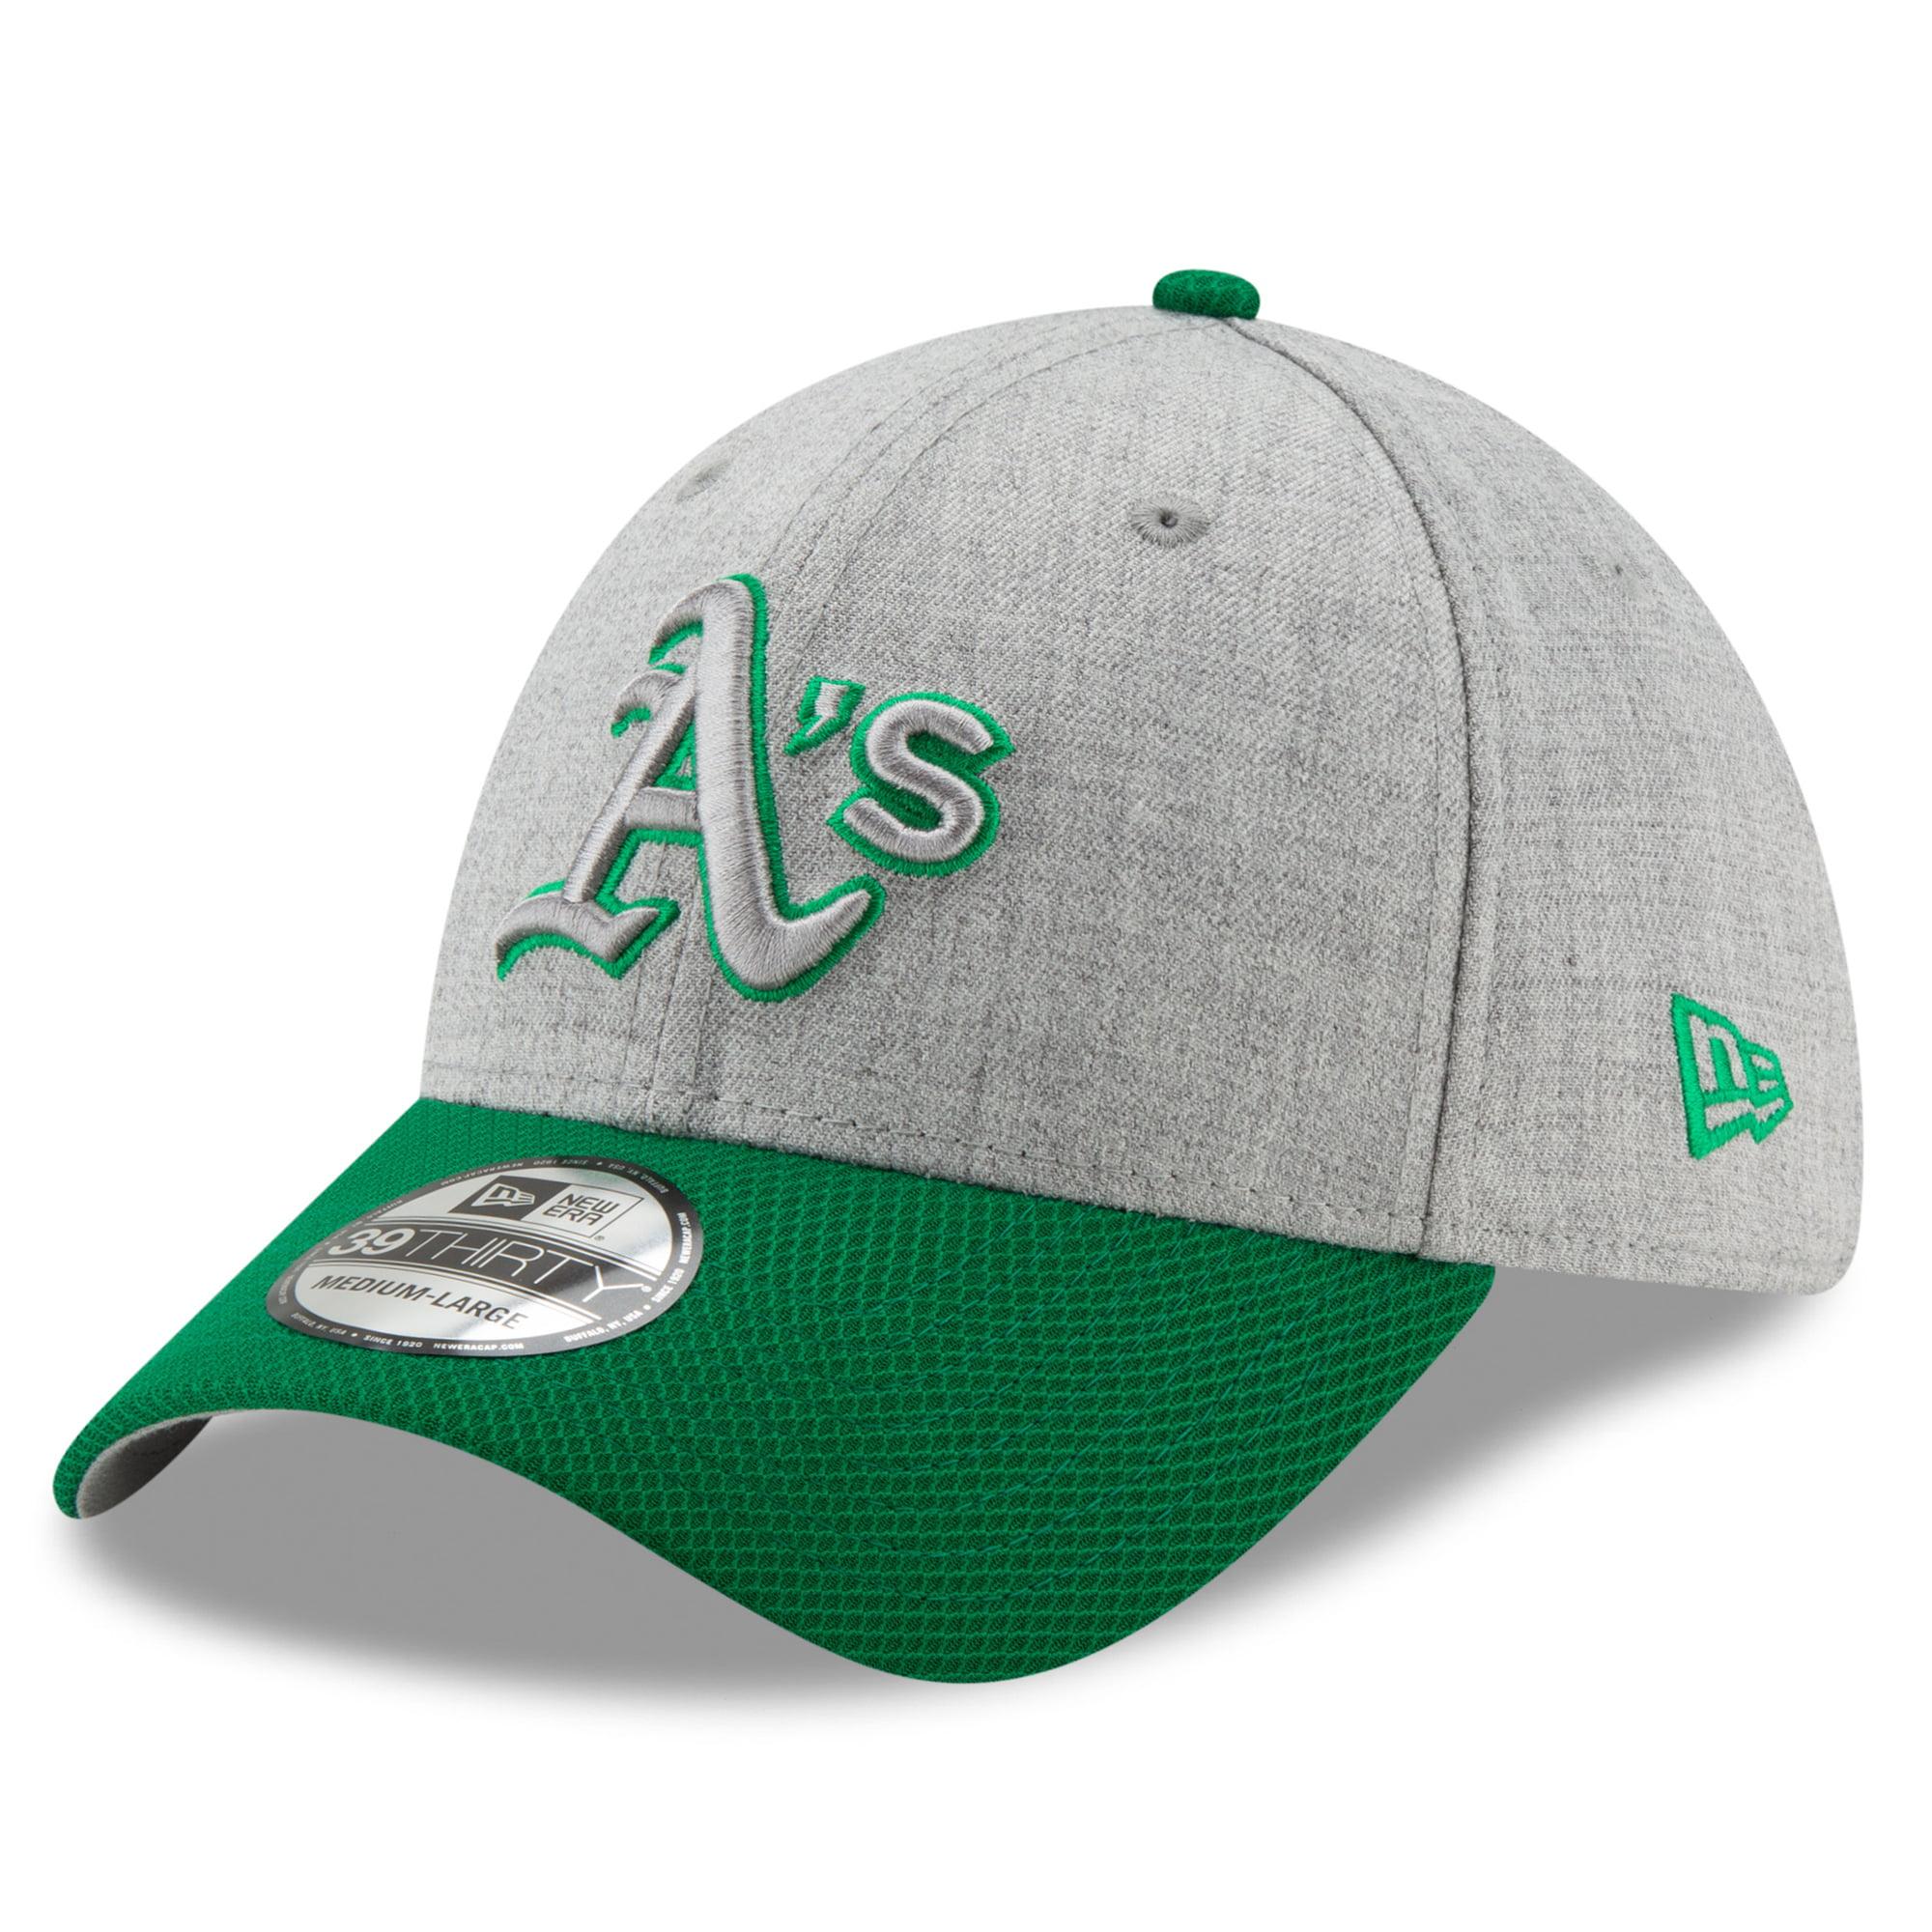 Oakland Athletics New Era St. Patrick's Day Change Up Redux 39THIRTY Flex Hat - Gray/Green